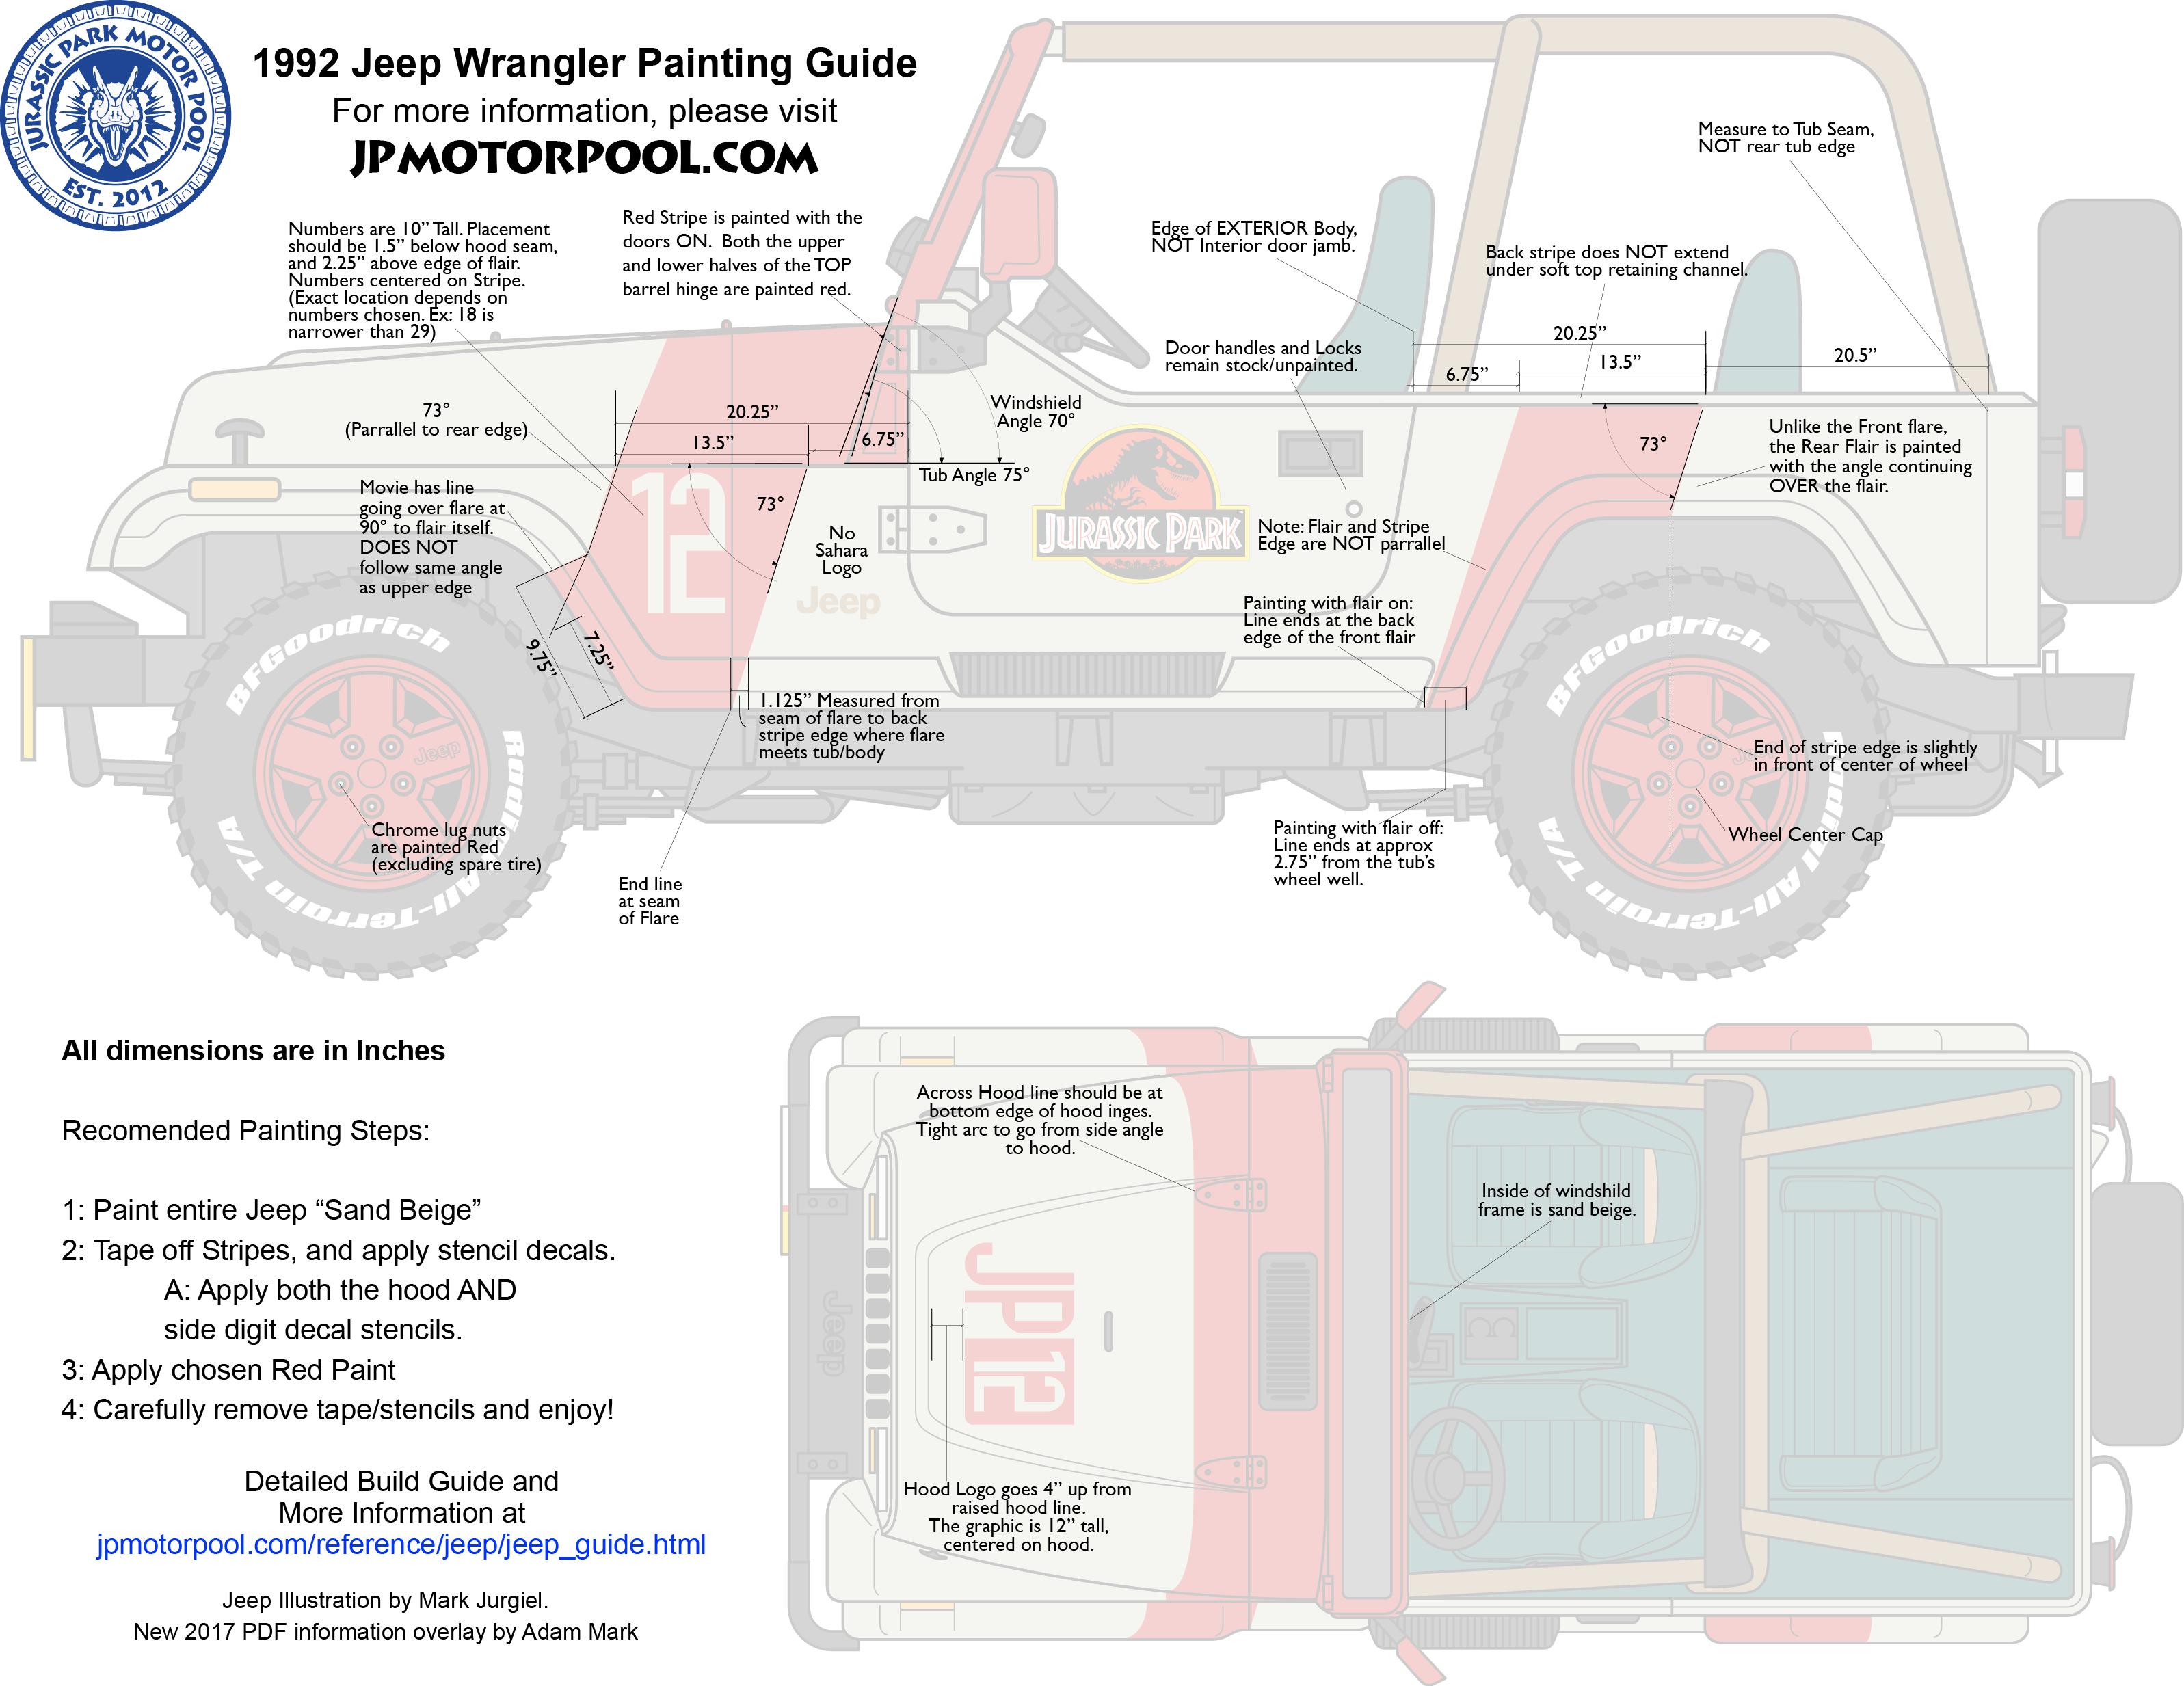 Reference Jeep Wrangler Guide Jurassic Park Motor Pool Jpmotorpool Com